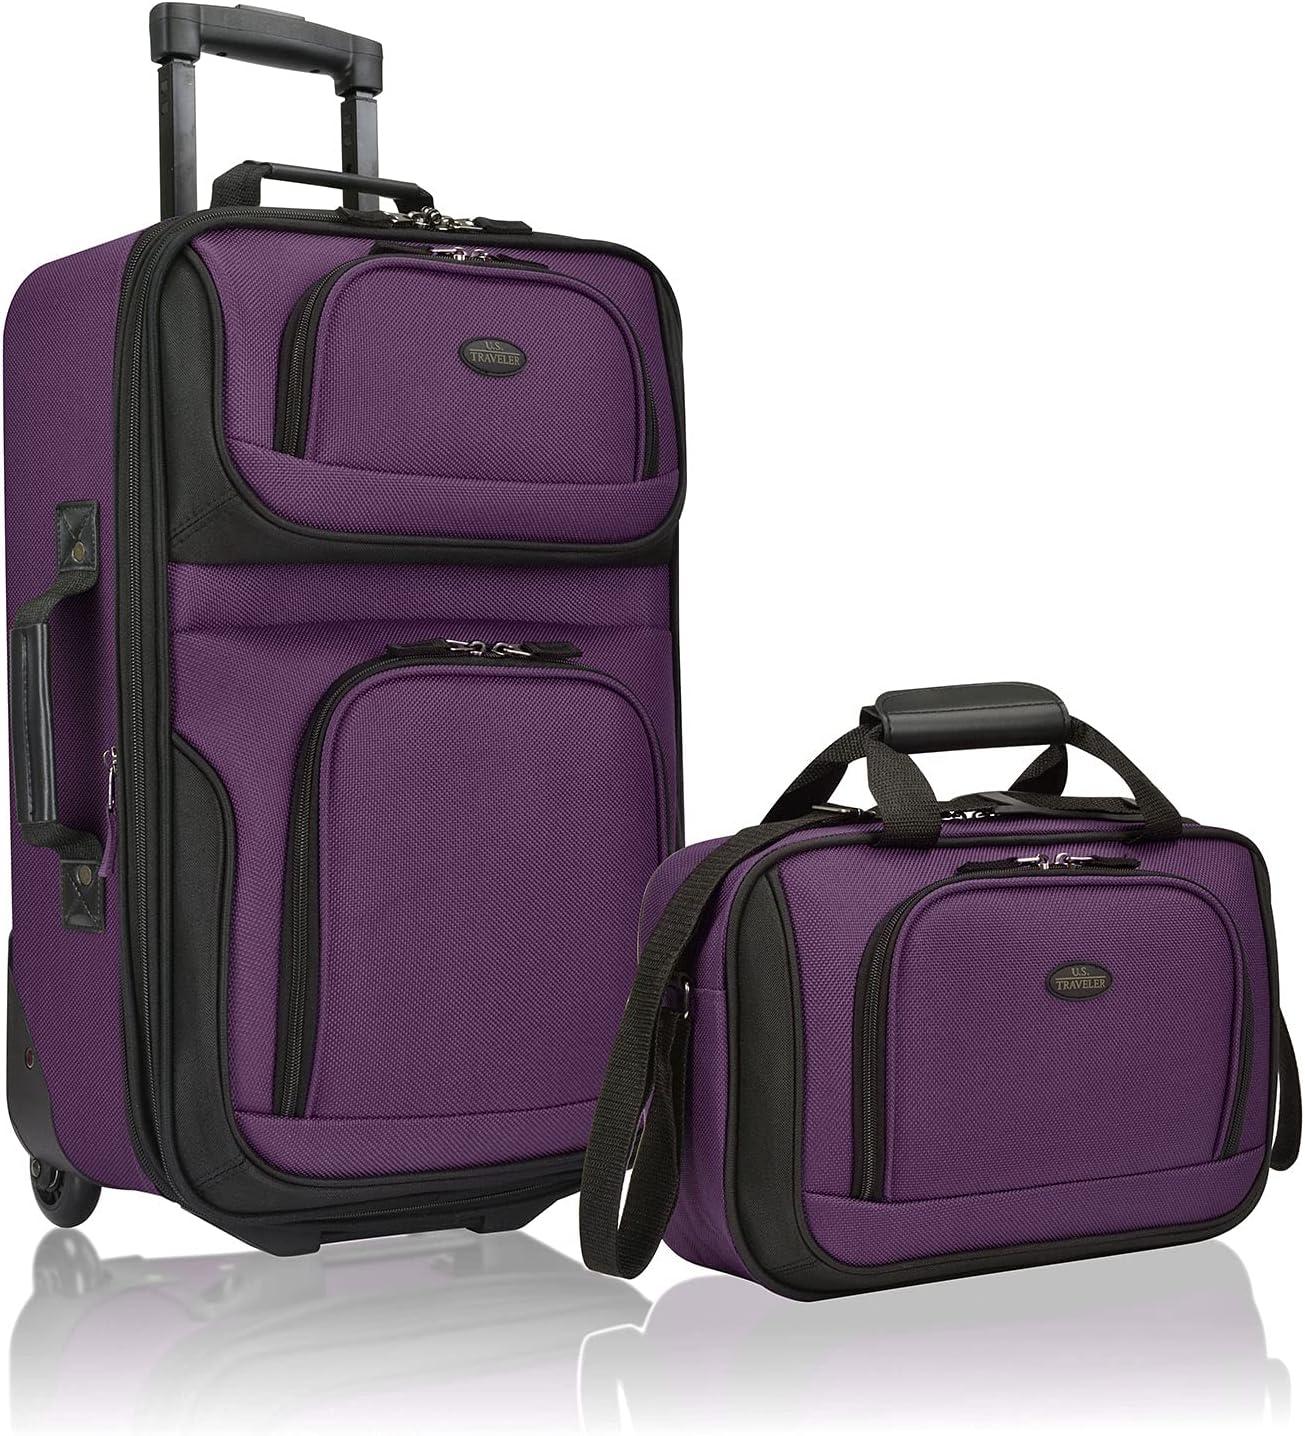 Elegant U.S. Traveler Cheap SALE Start Rio Rugged Fabric Set Luggage Carry-On Expandable